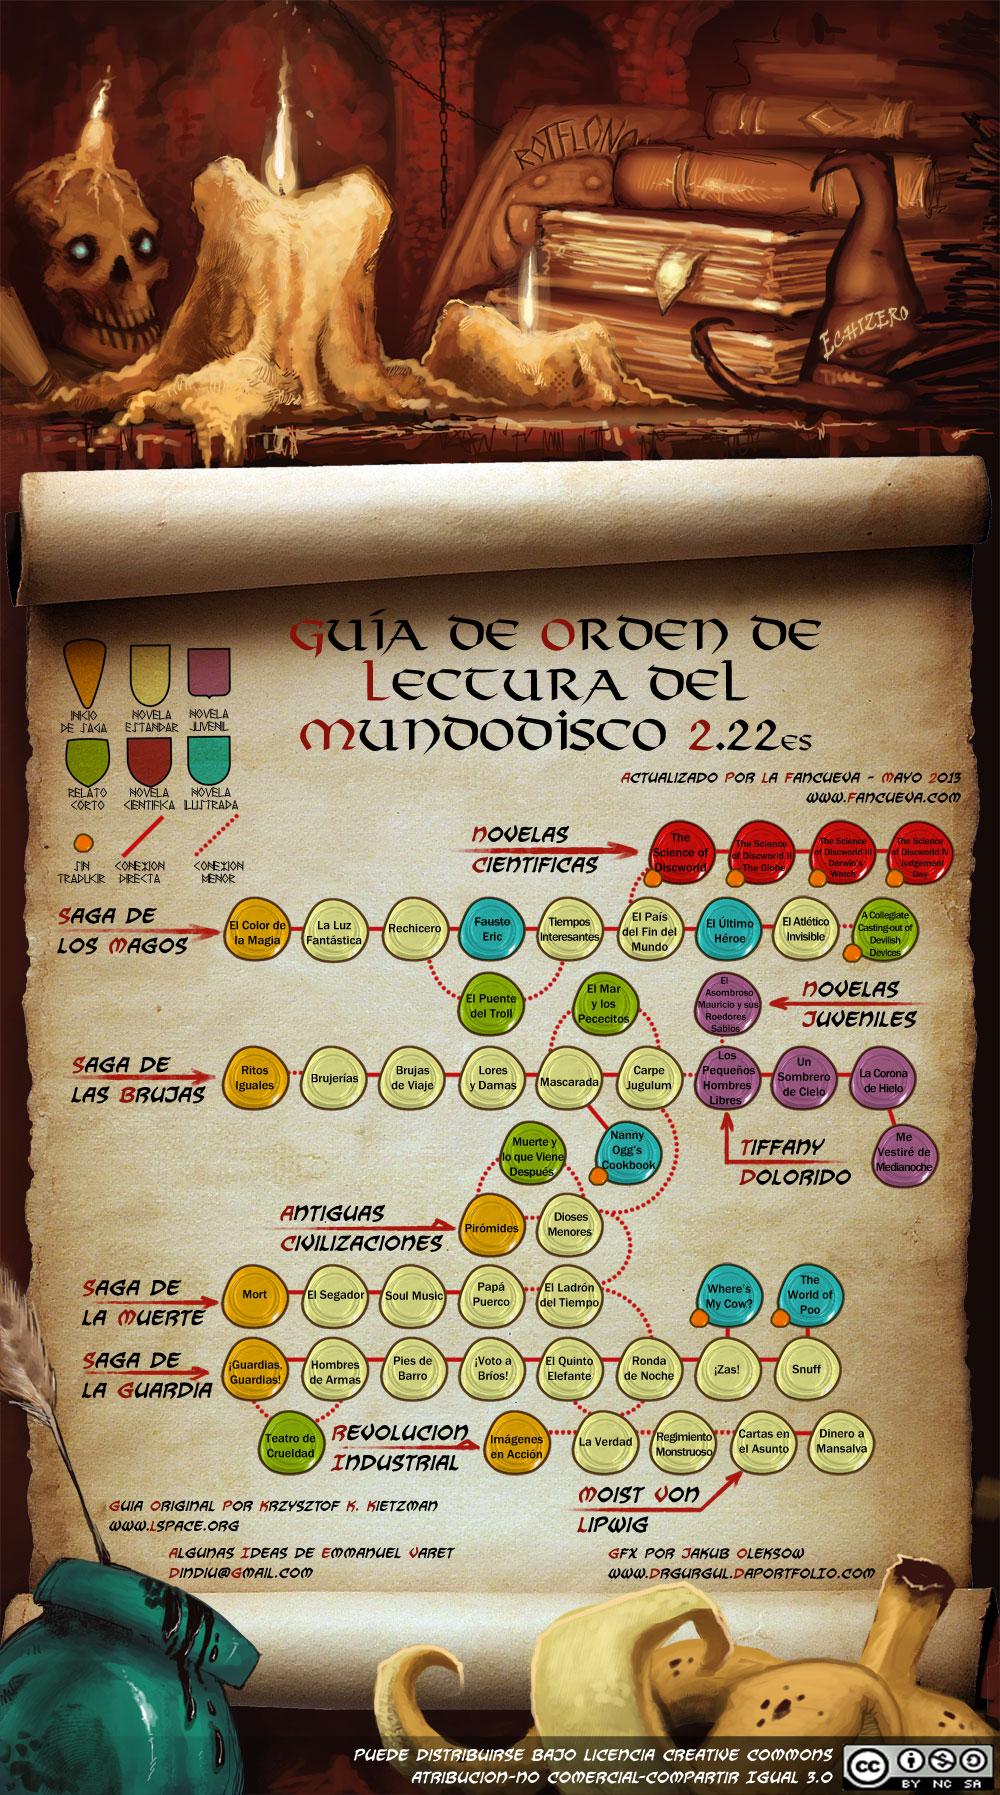 Guía de Orden de Lectura del Mundodisco, v.2.22